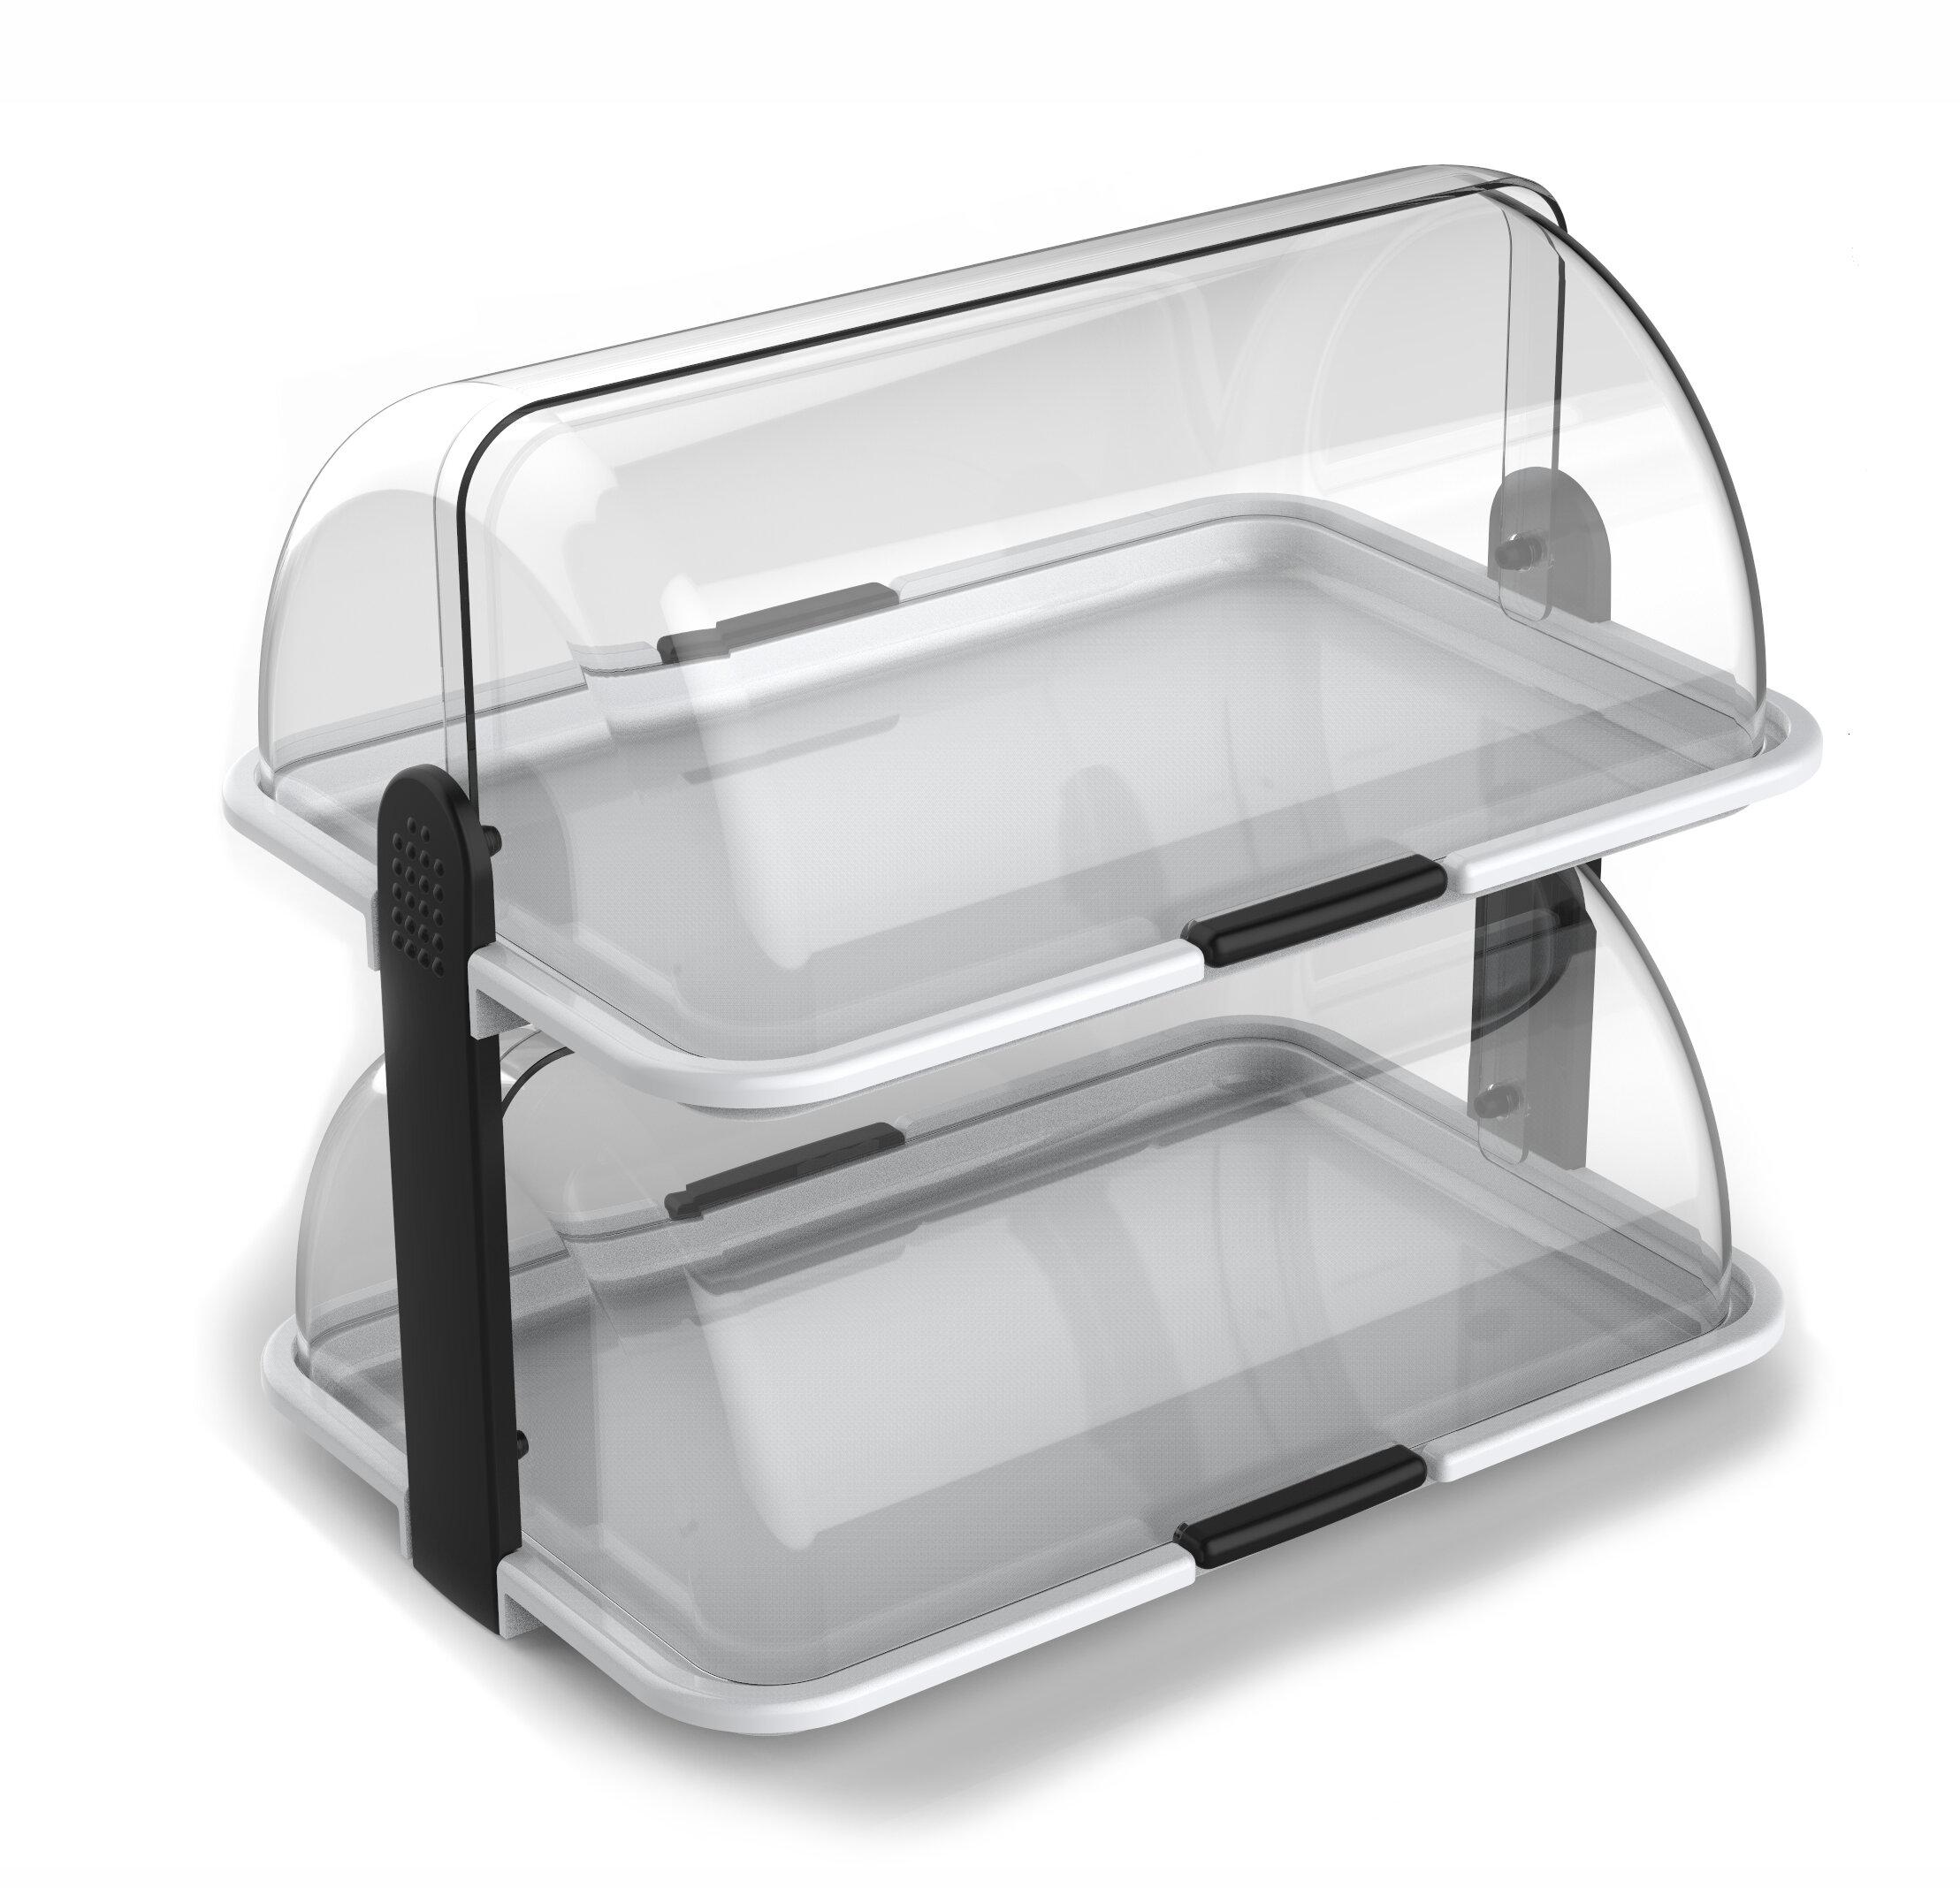 Bon Cuisinox Double Decker Polybox And Bakery Bread Box | Wayfair